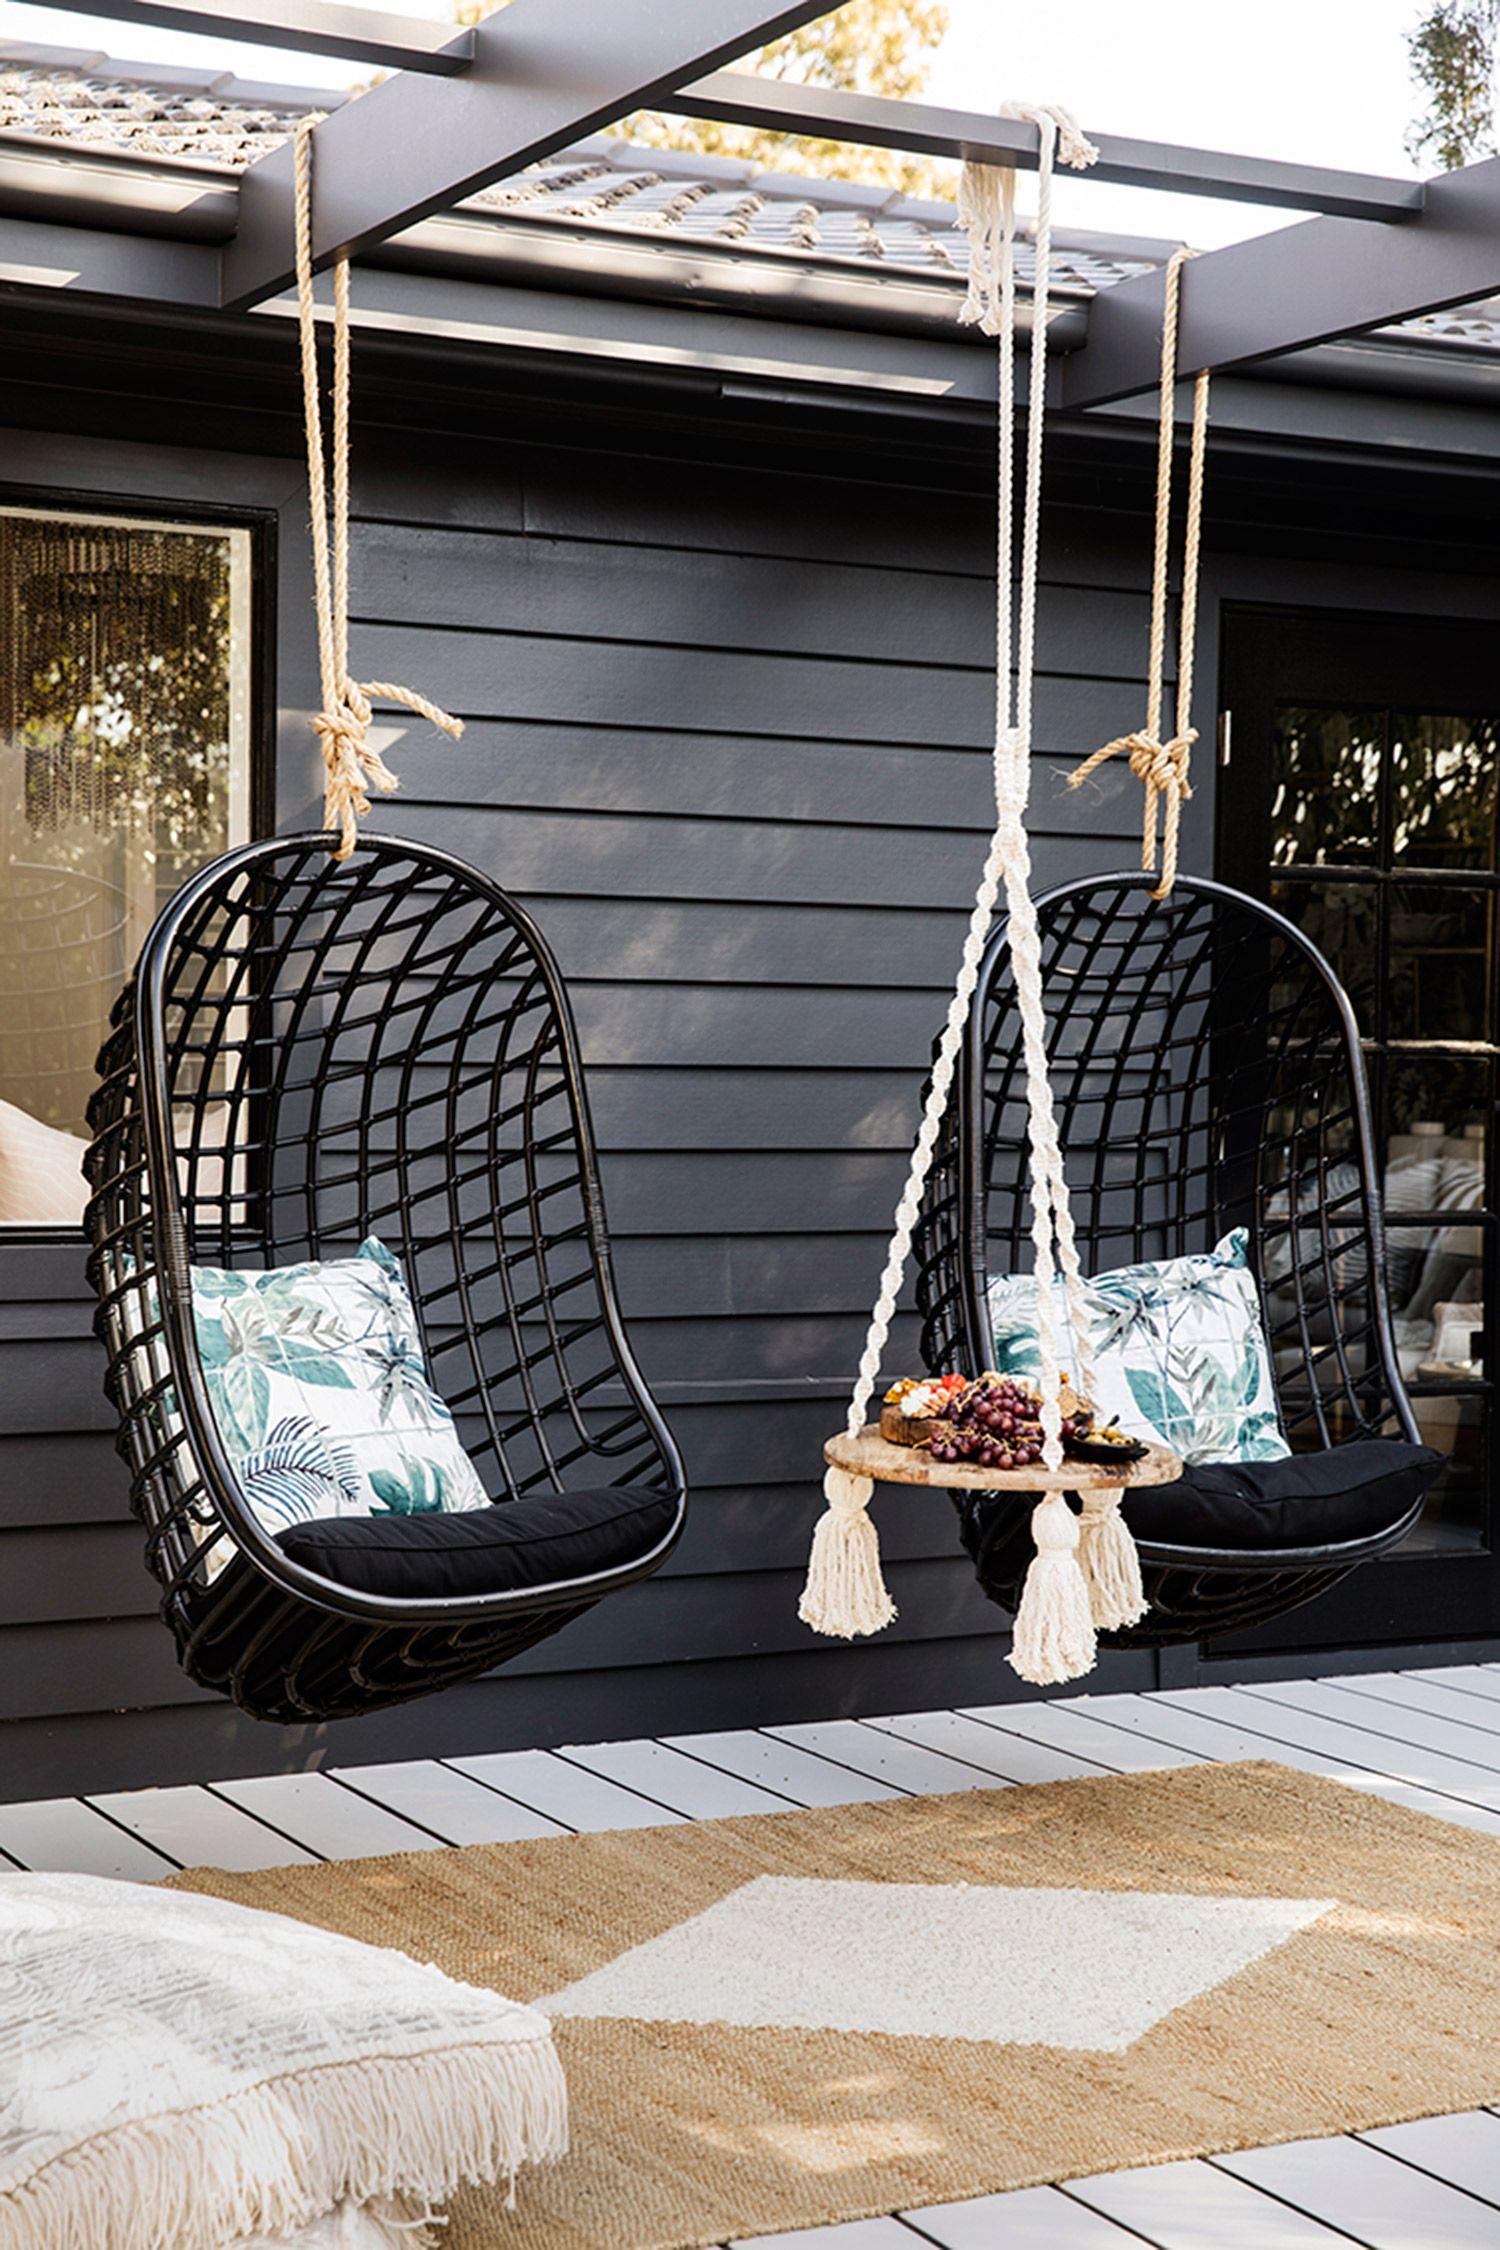 Three Birds Renovations House 9 Exterior Alfresco Hanging Chair Outdoor Outdoor Hammock Chair Three Birds Renovations